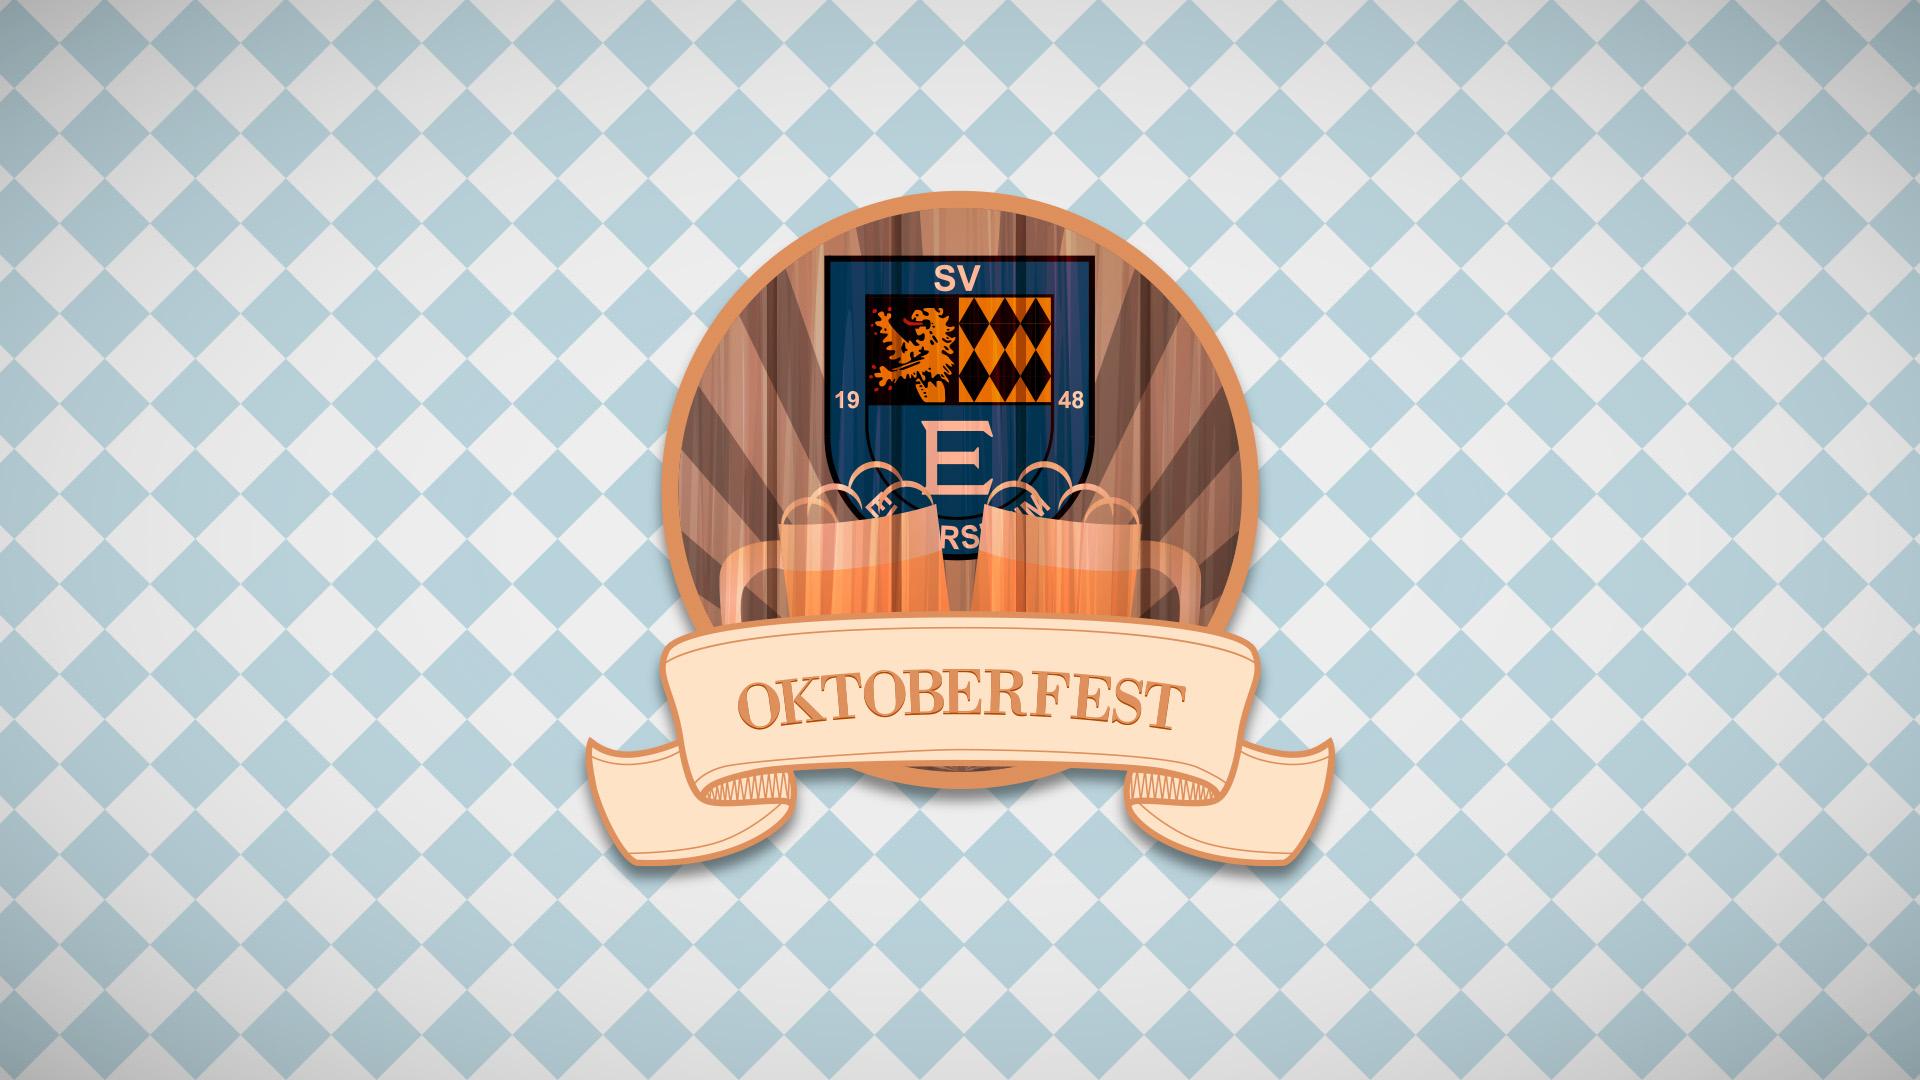 Facebook Veranstaltung Oktoberfest